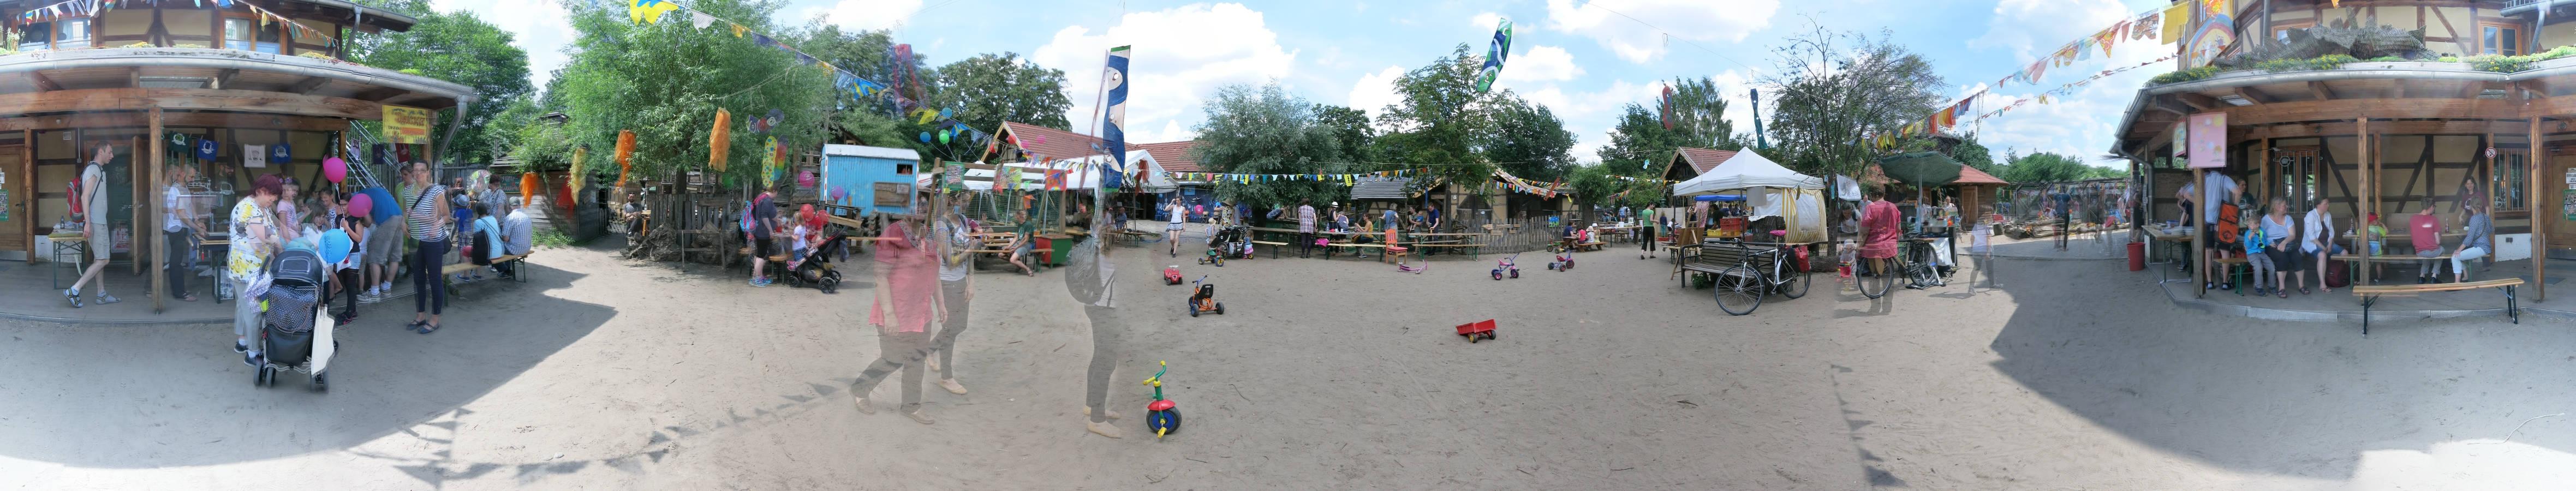 Panorama-kl